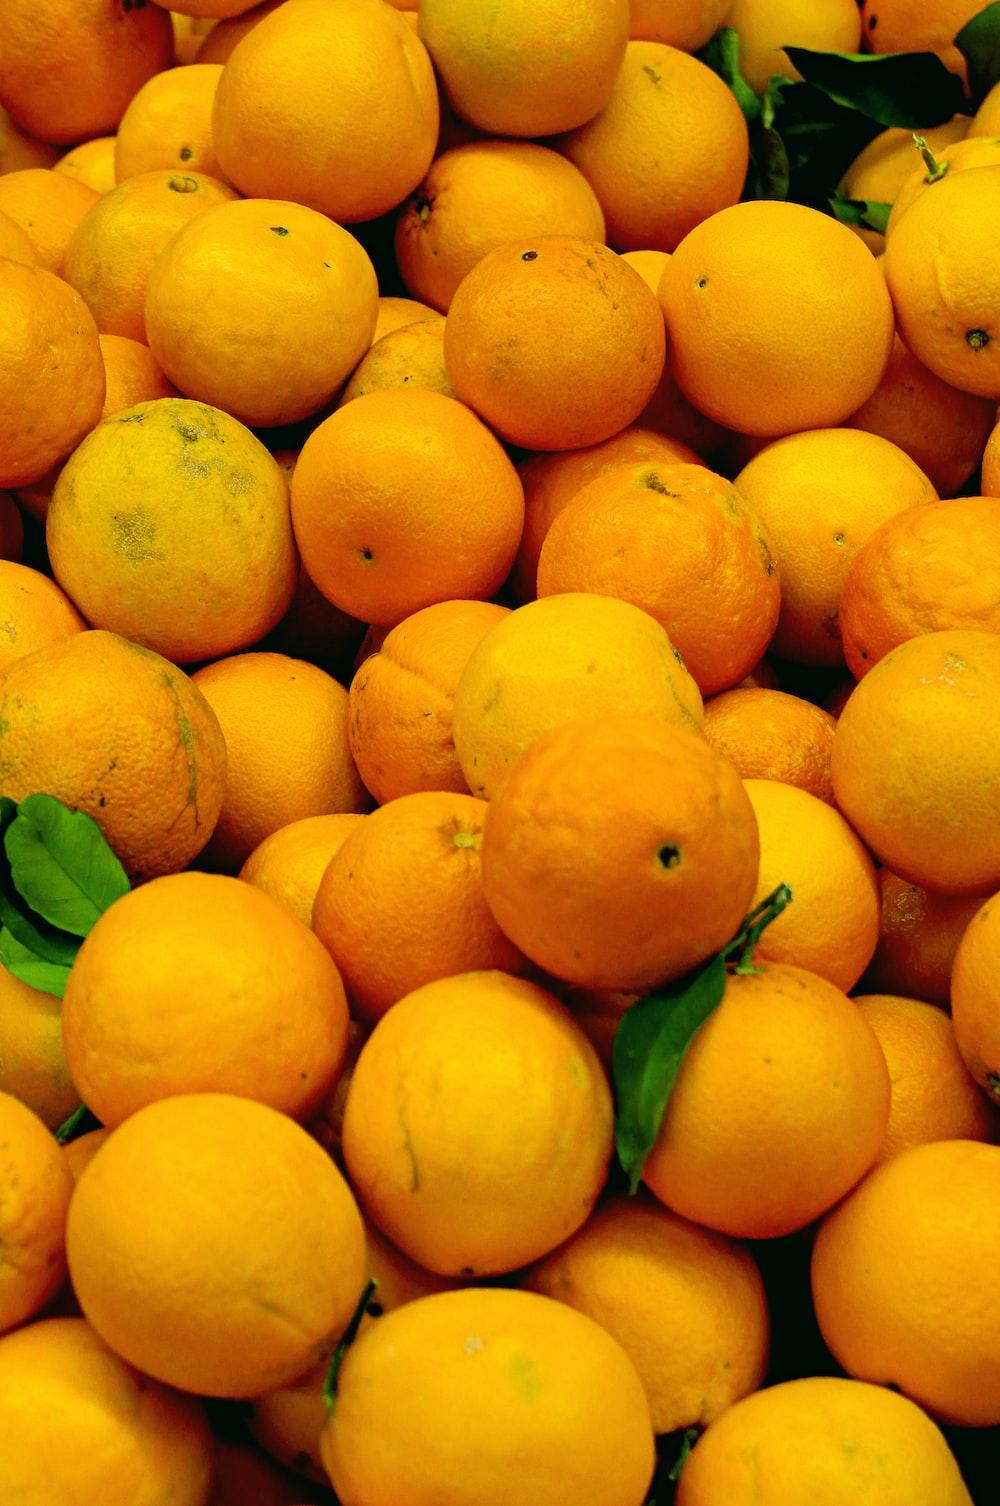 orange fruits on focus photography